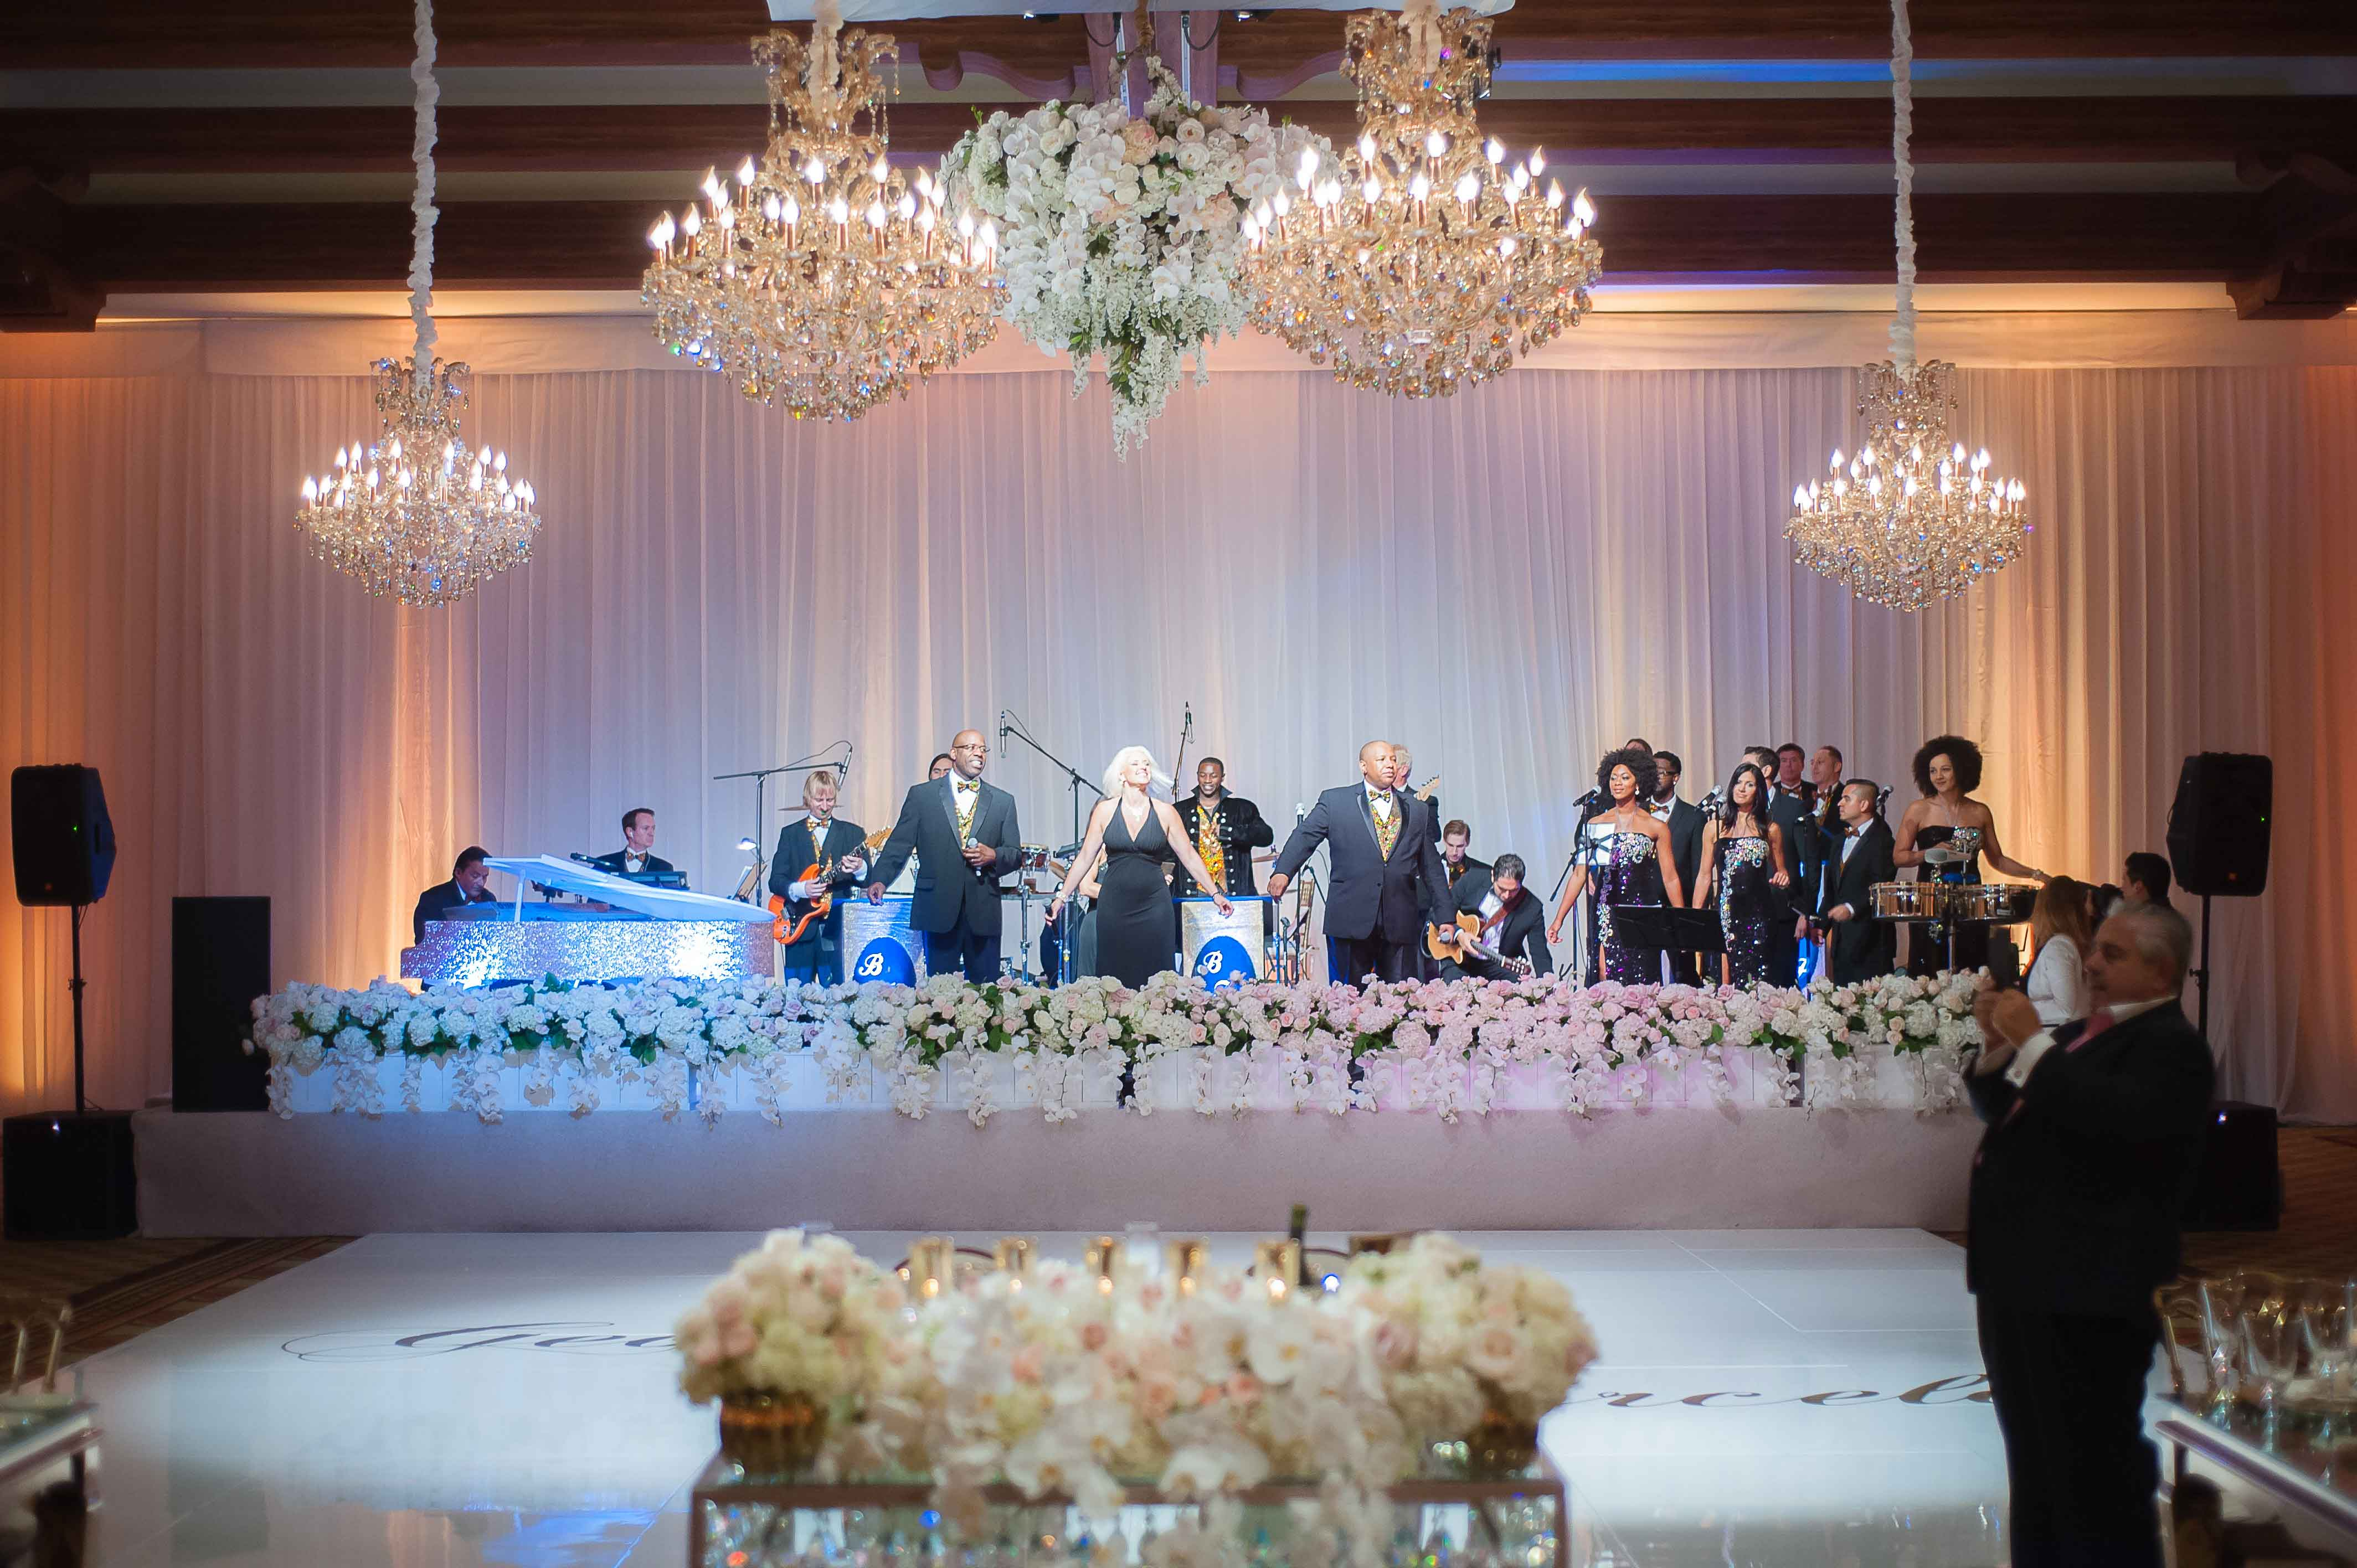 chandeliers above the dance floor at wedding reception